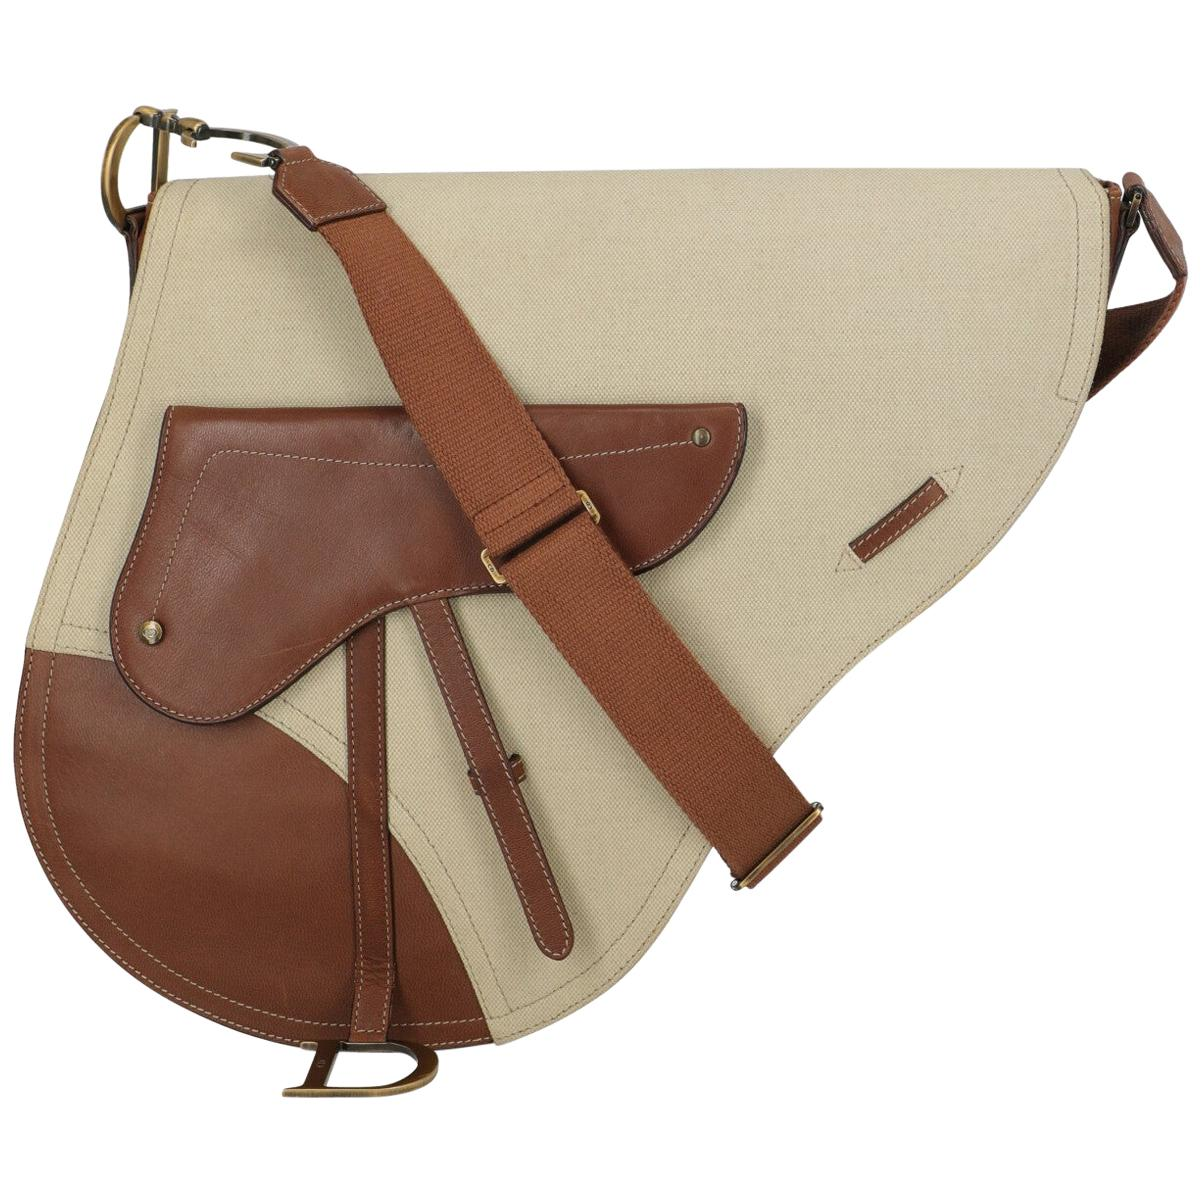 Dior Women's Crossbody Bag Saddle Beige/Brown Leather